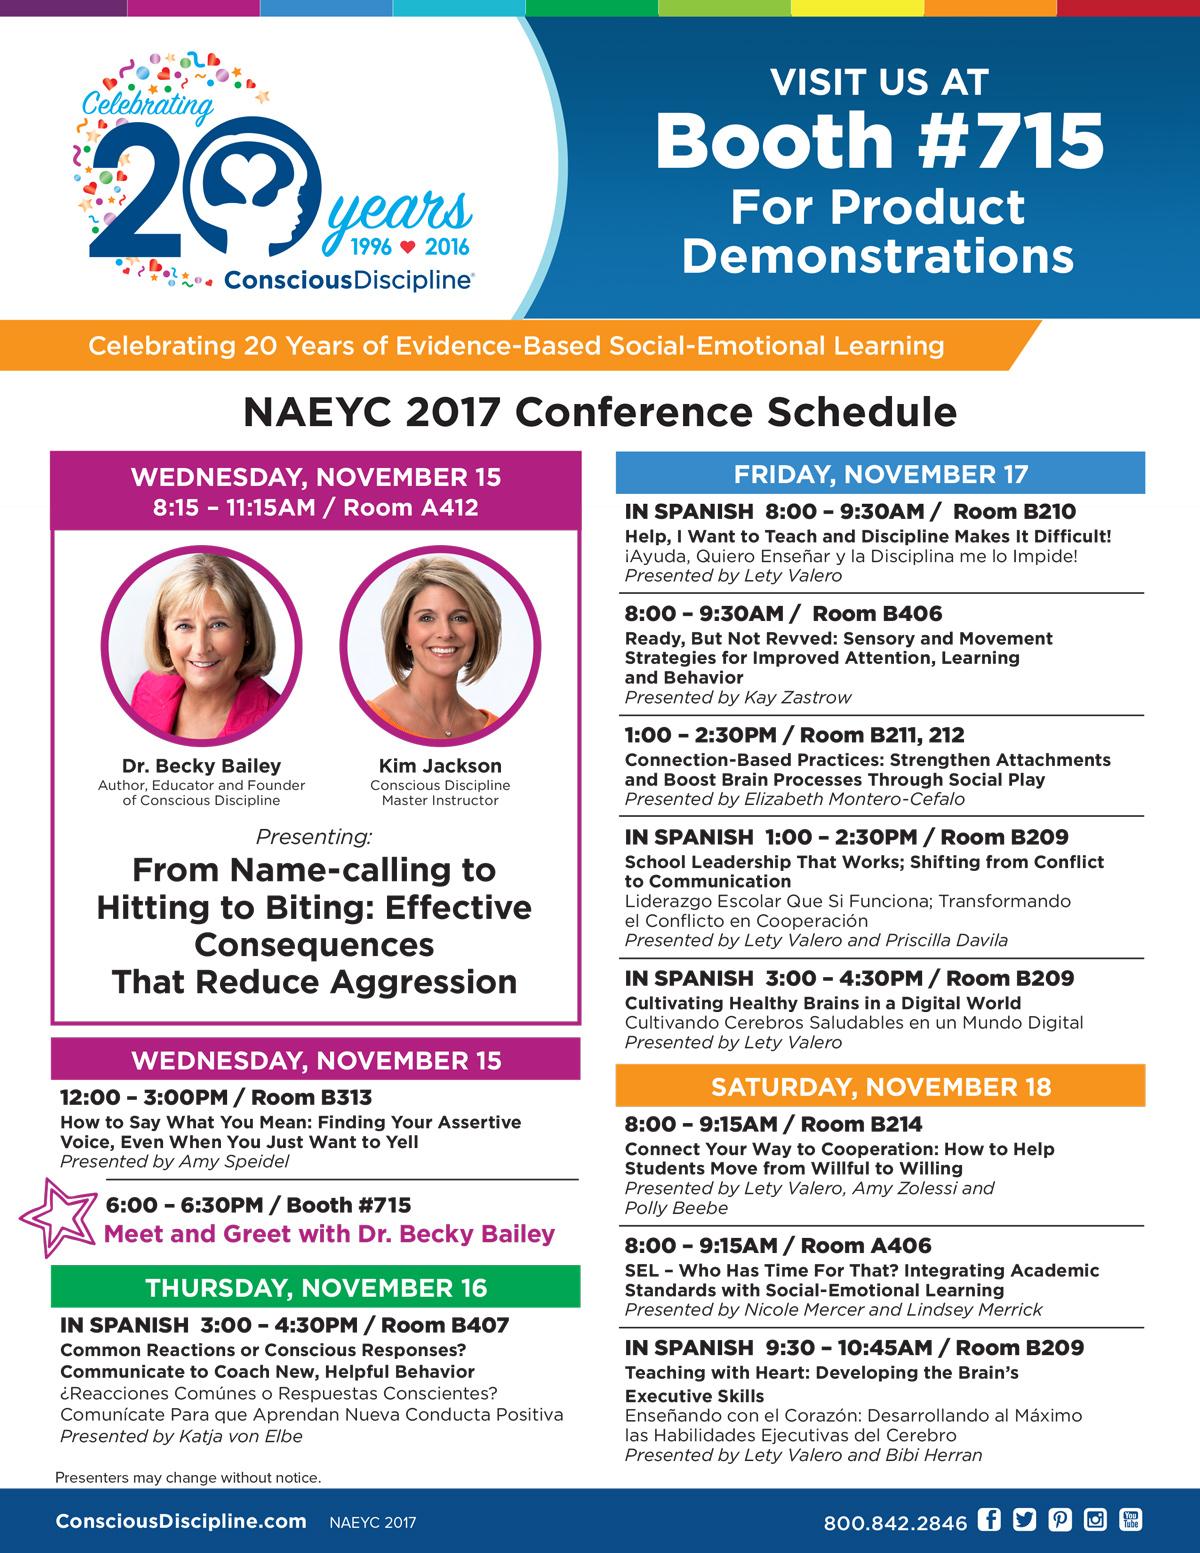 2017 NAEYC Schedule Flyer